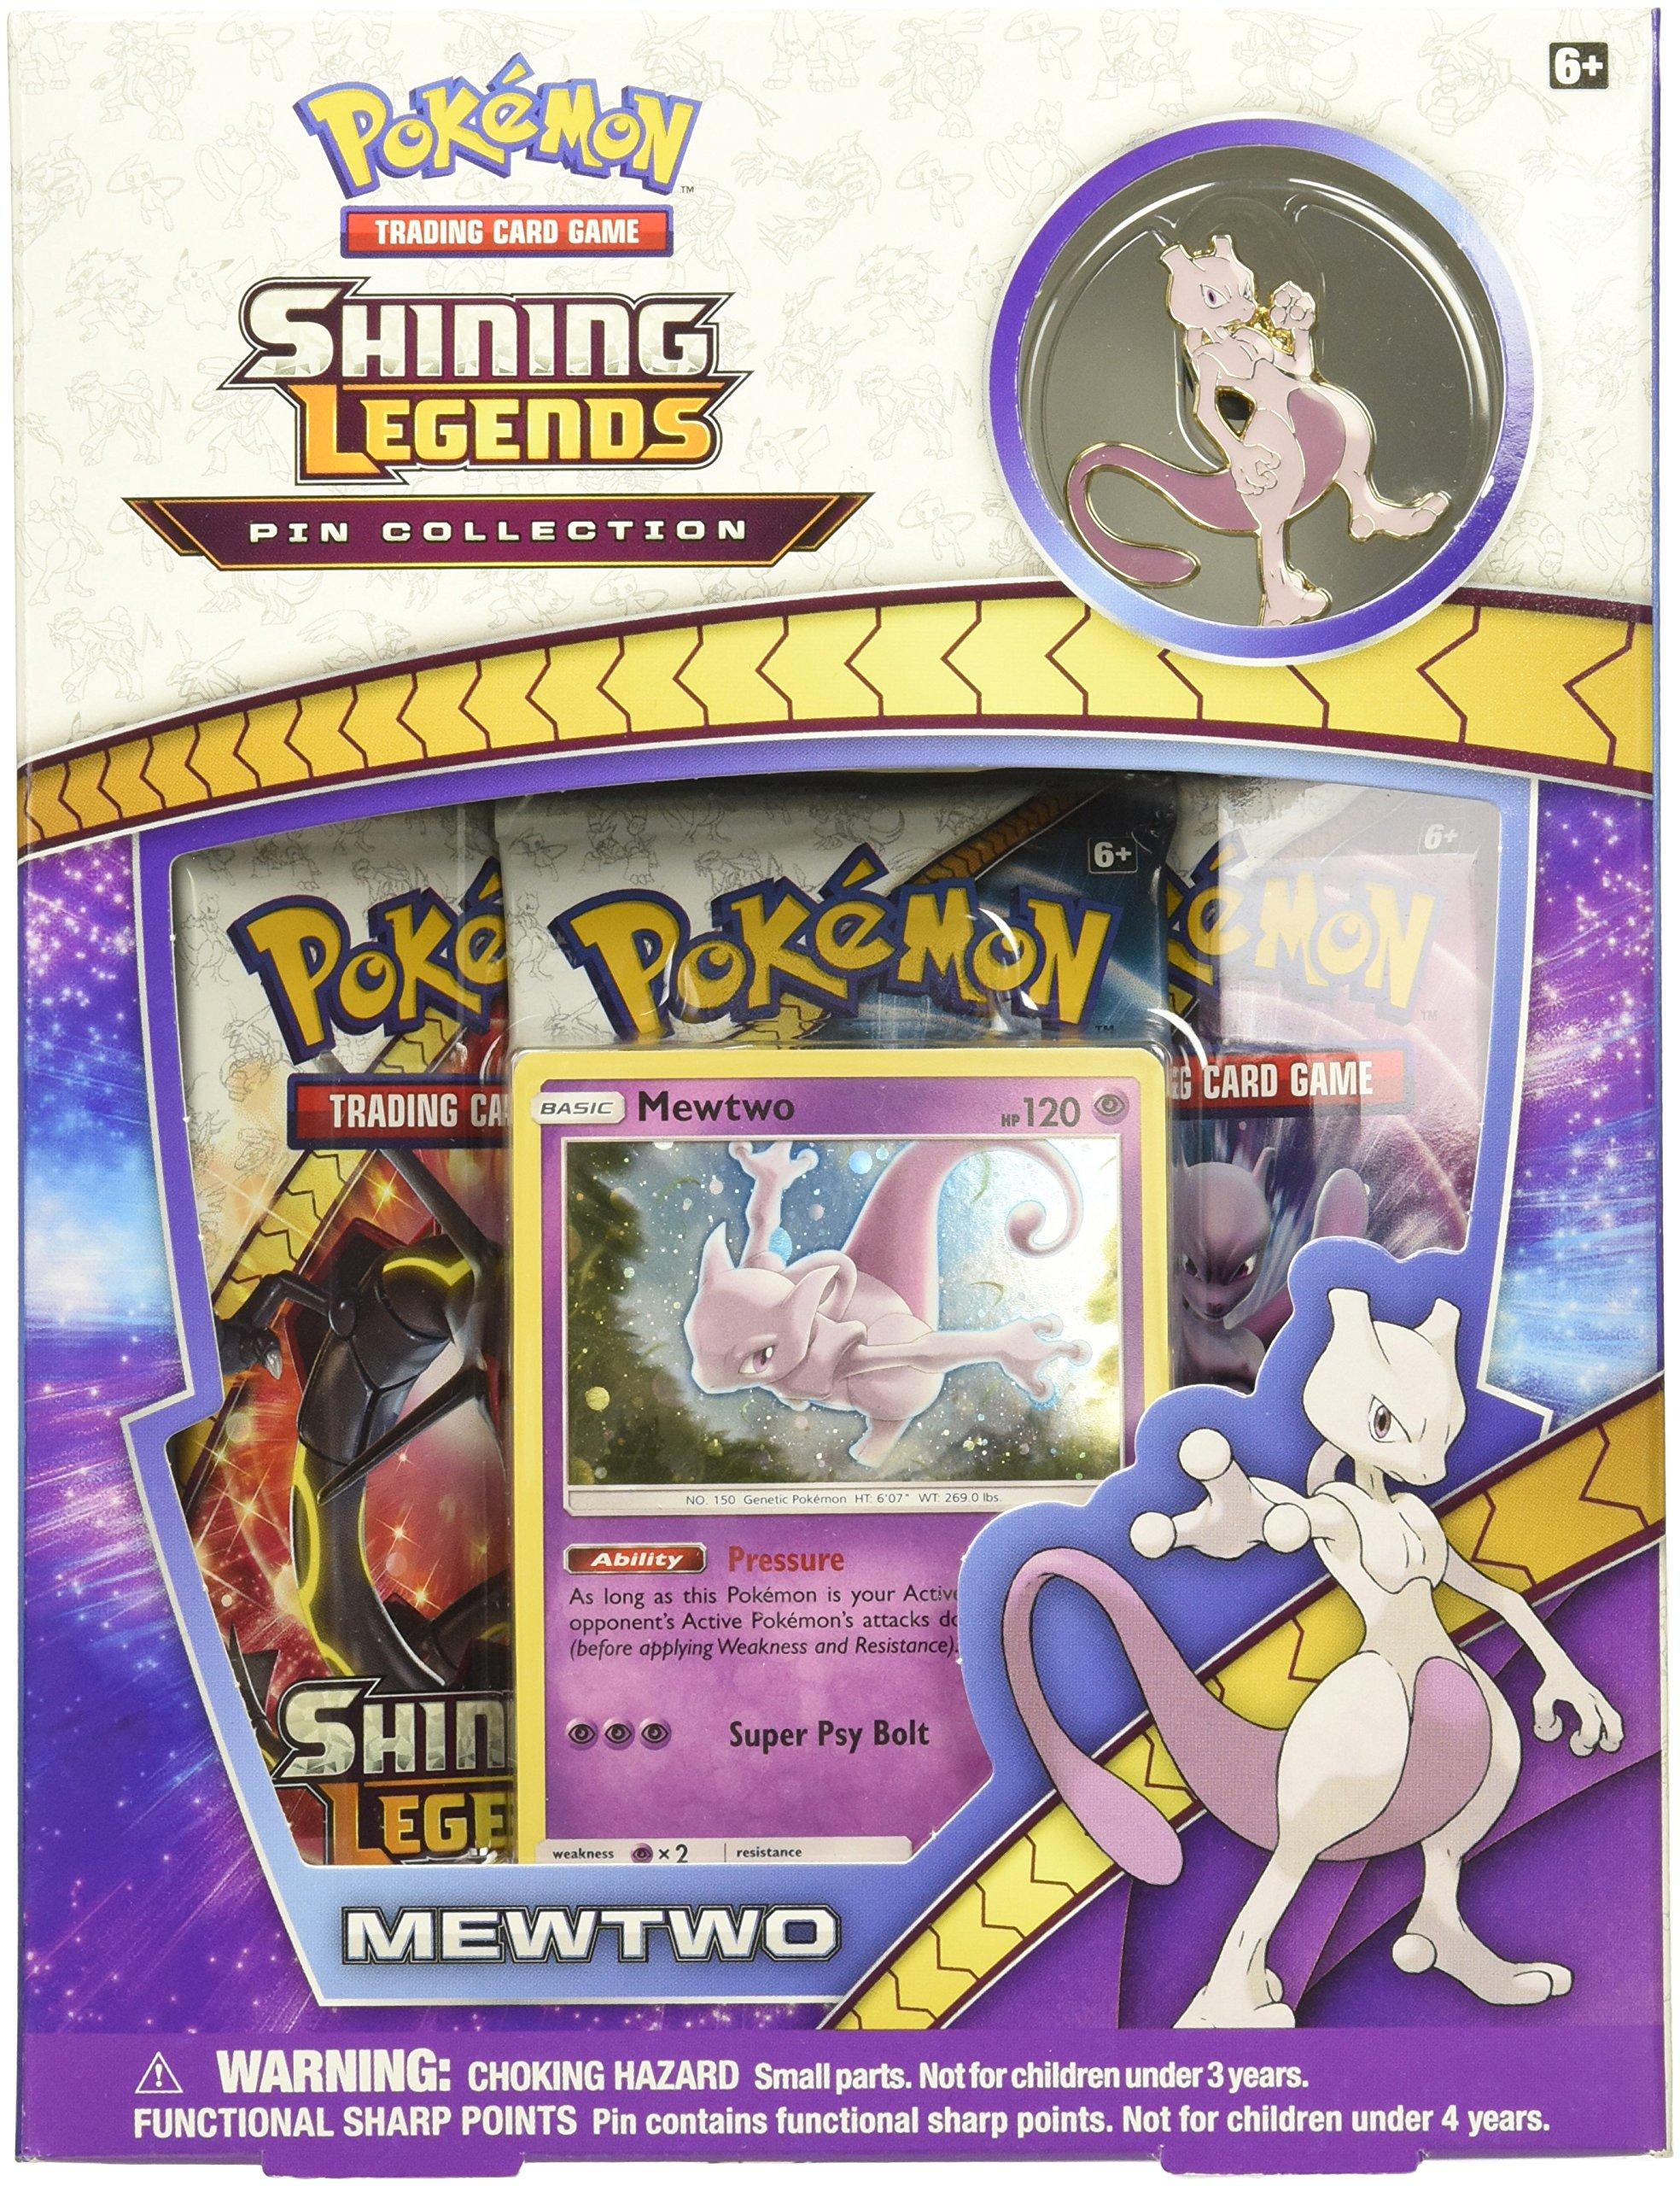 Pokémon Cards POKSM35PINBX SM3.5 Shining Legends Mewtwo Pin Box by Pokemon